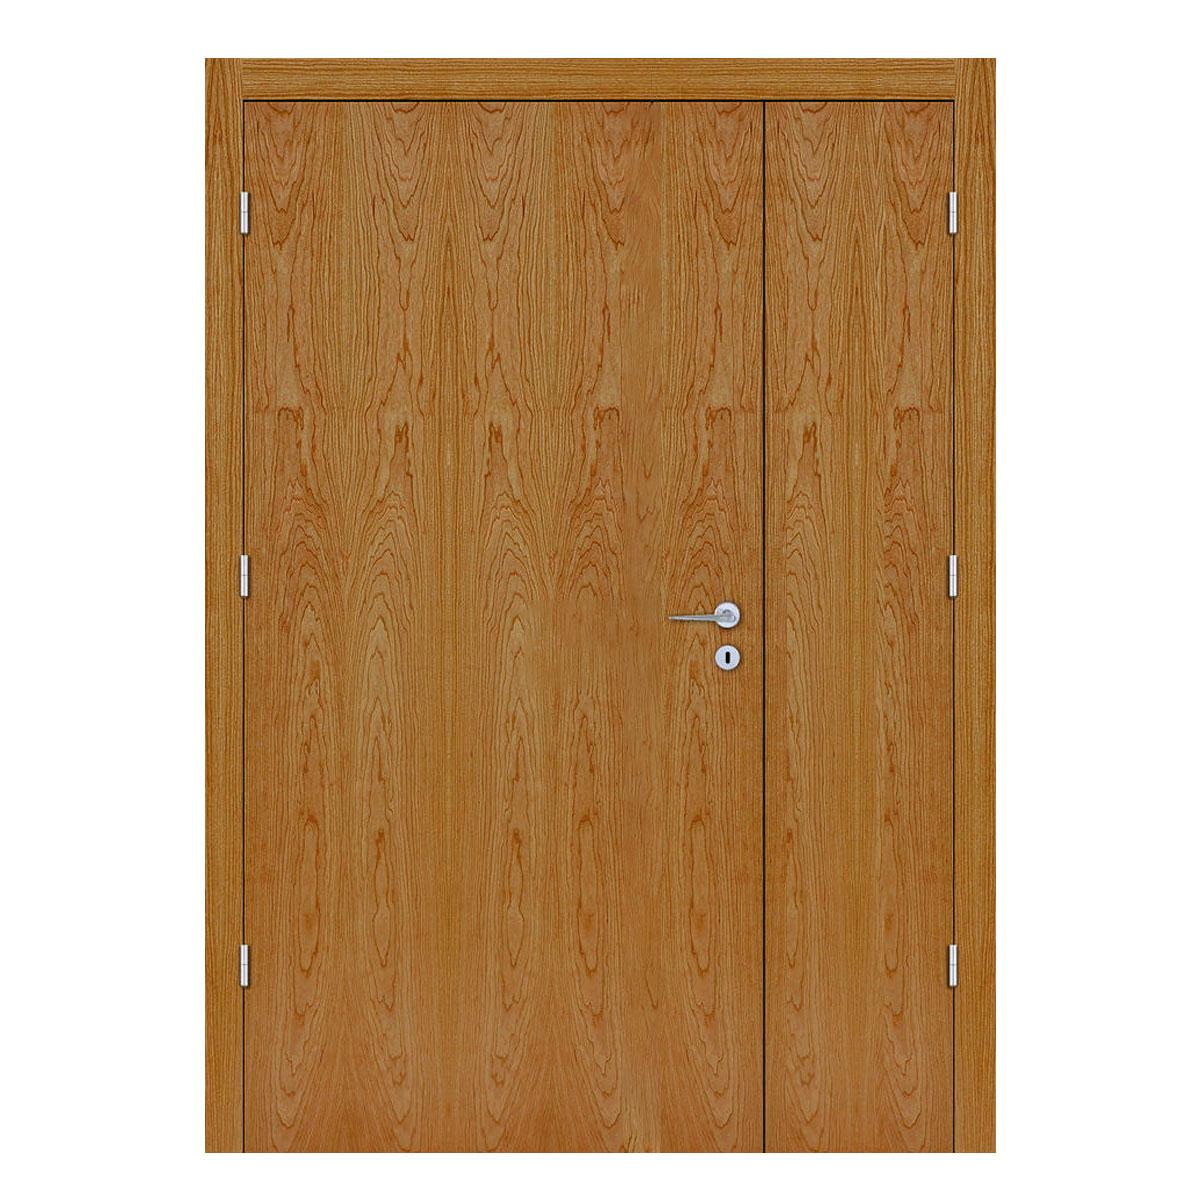 Cherry Hospital Doors